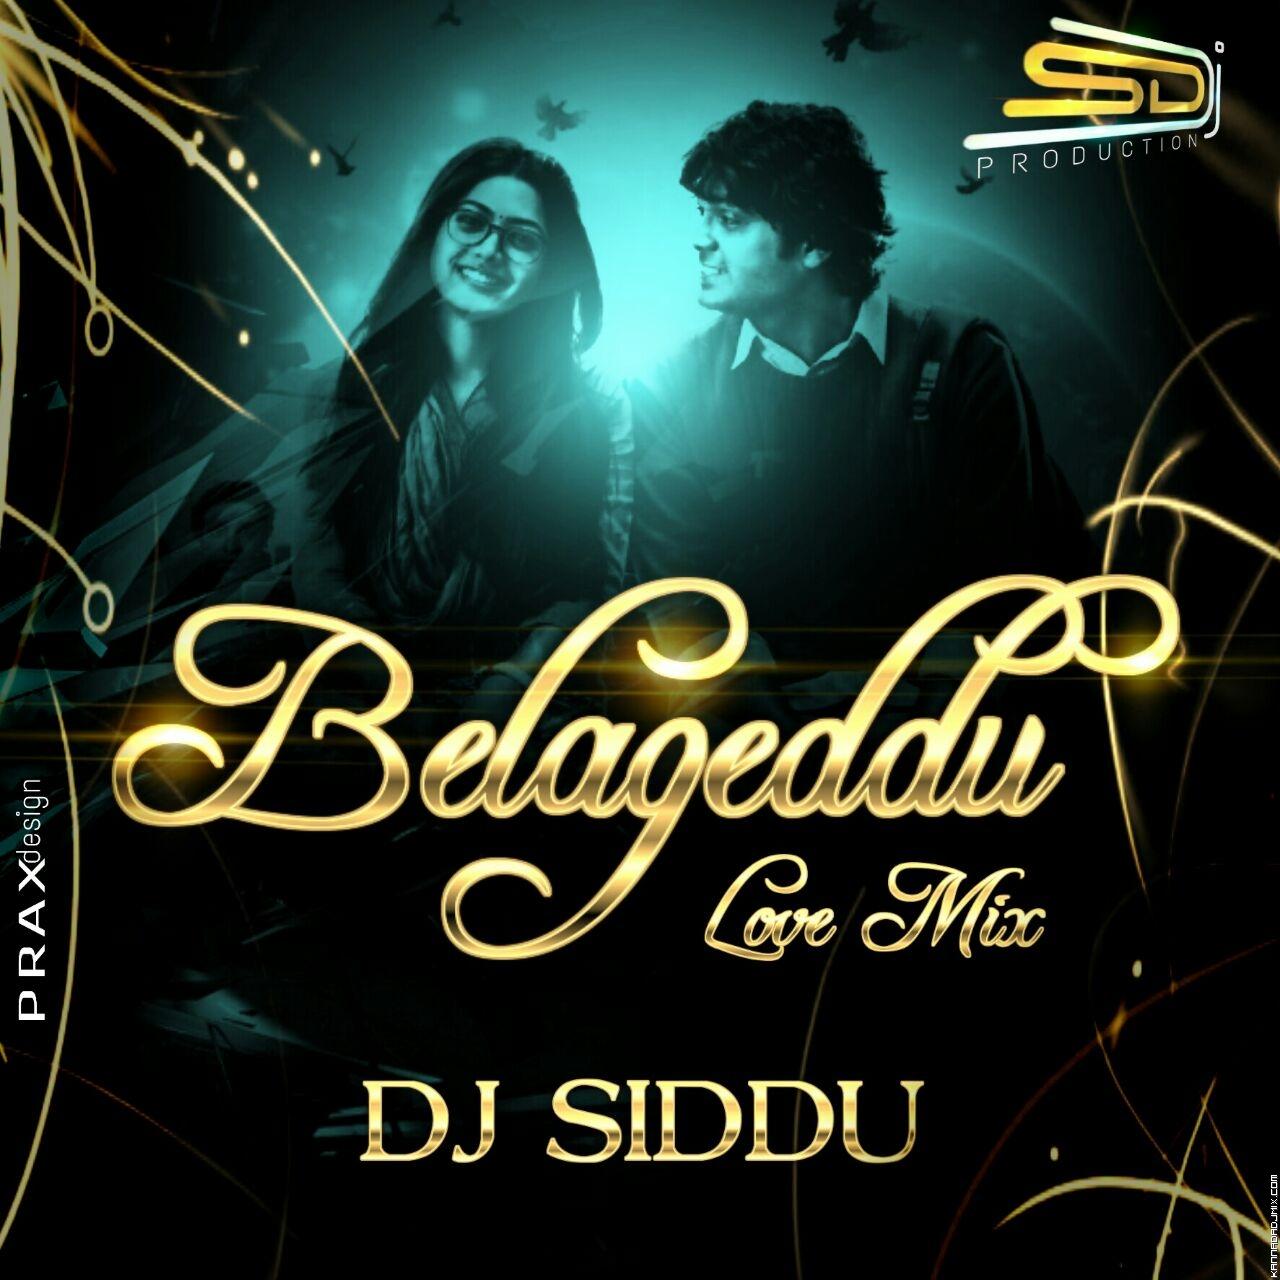 Belageddu Kirik Party [Love Dance Mix] Dj Siddu Dharwad.mp3